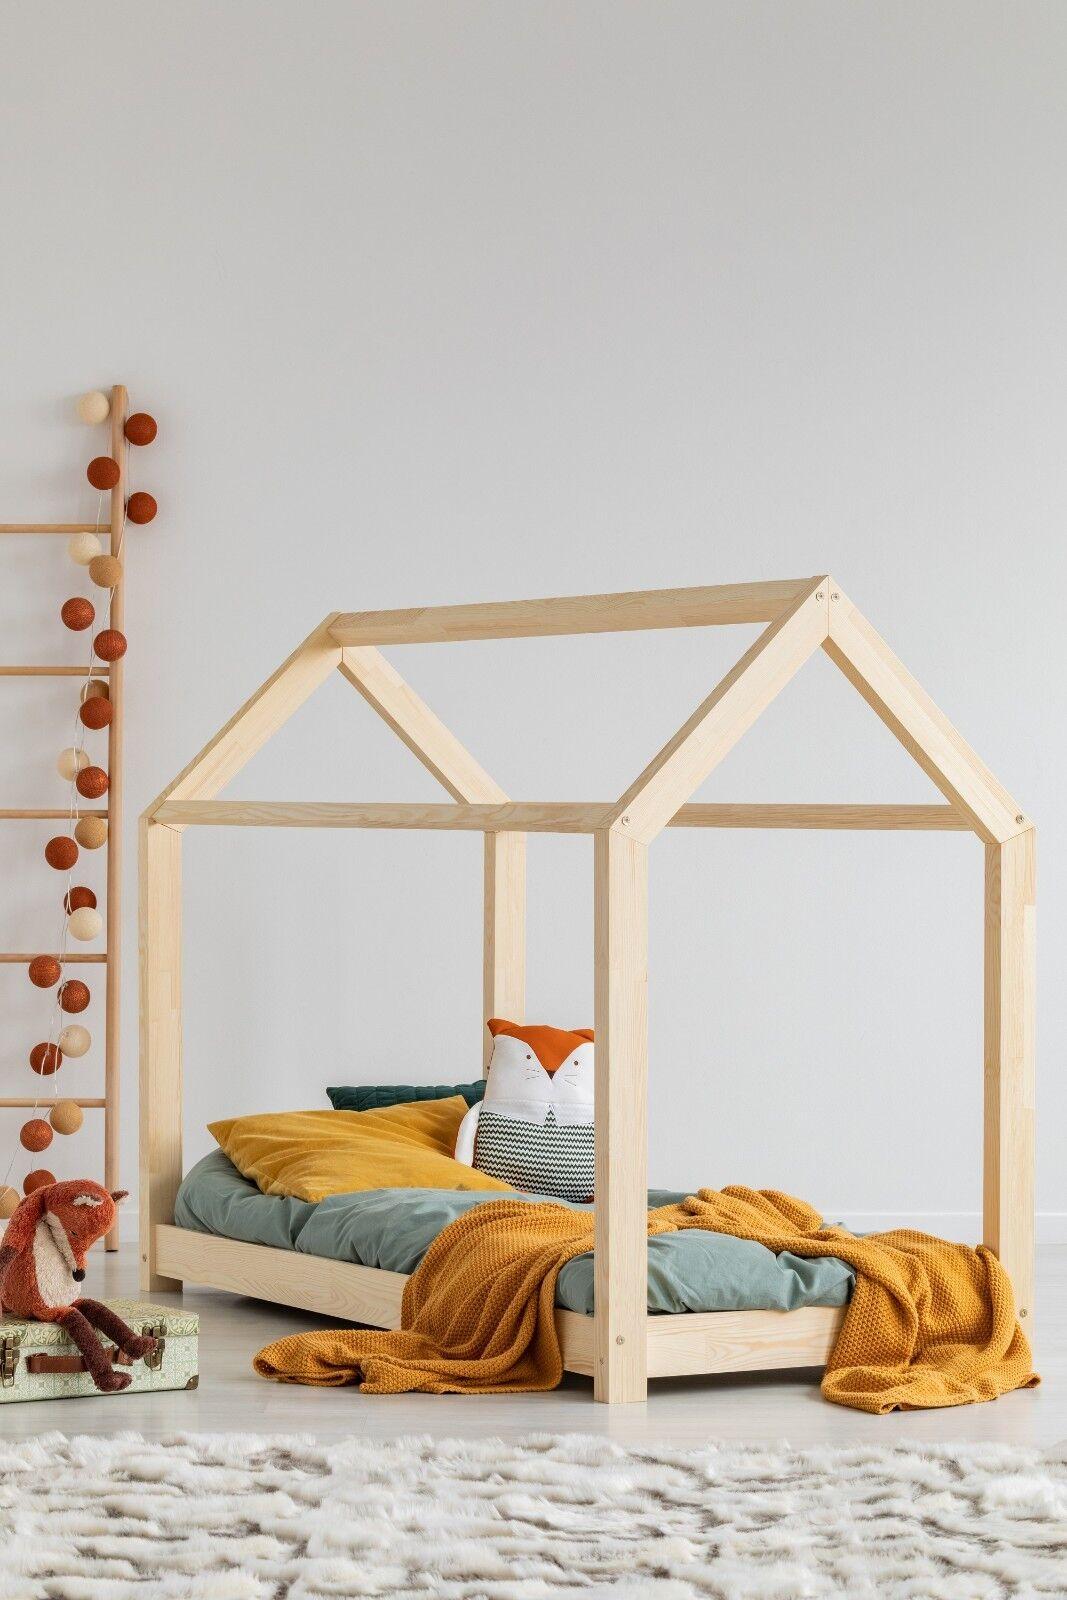 Enfants Lit Maison Cadre Lit Kids Beds 29 dimension Kinderbett